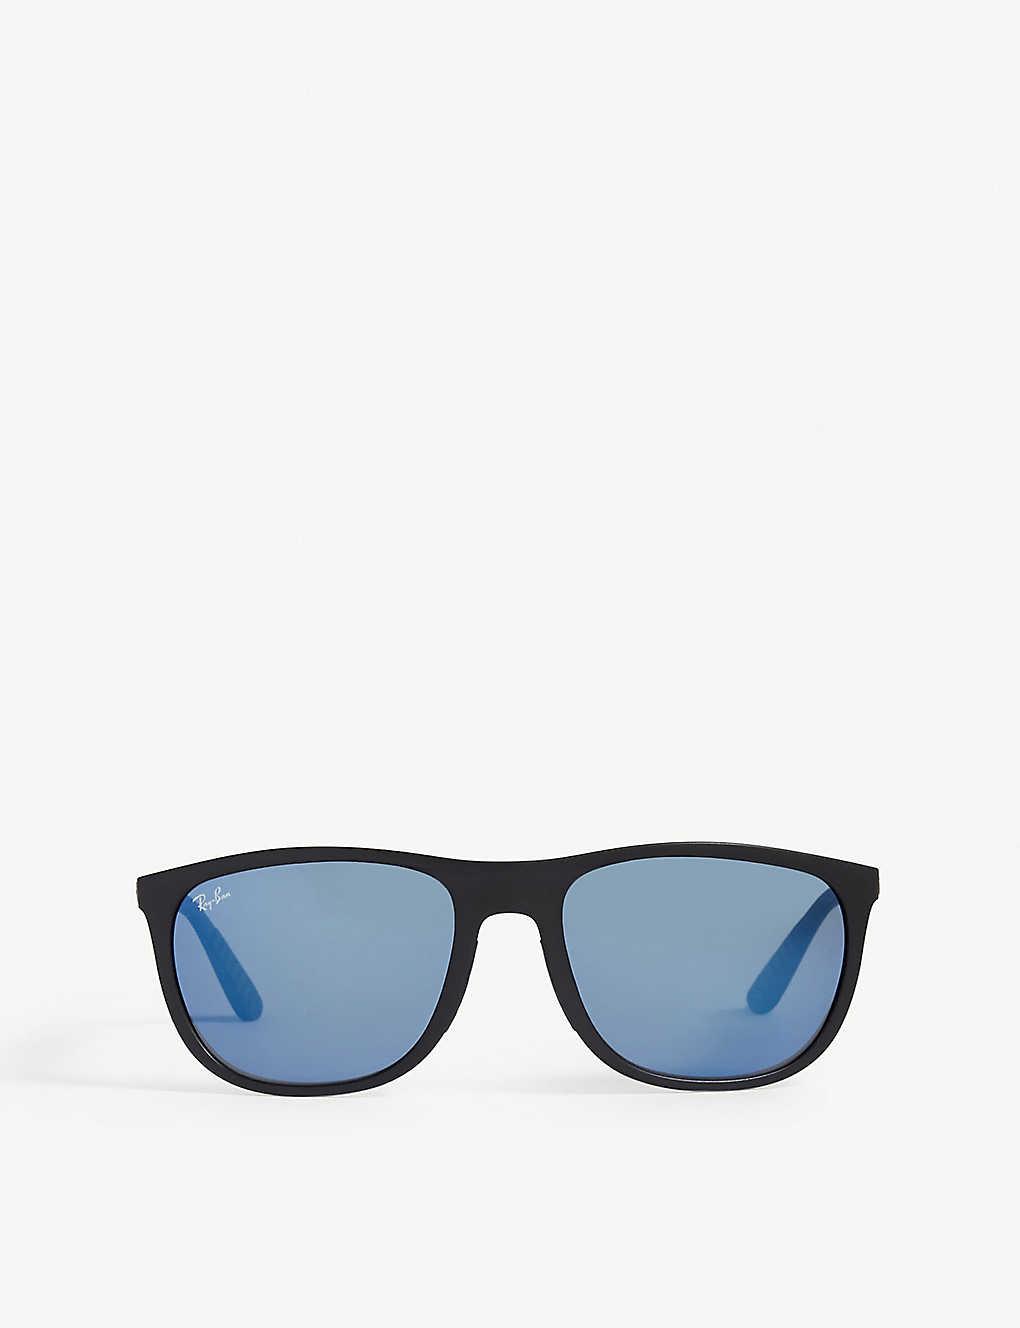 ca5dd19df1 RAY-BAN - Rb4291 square-frame sunglasses